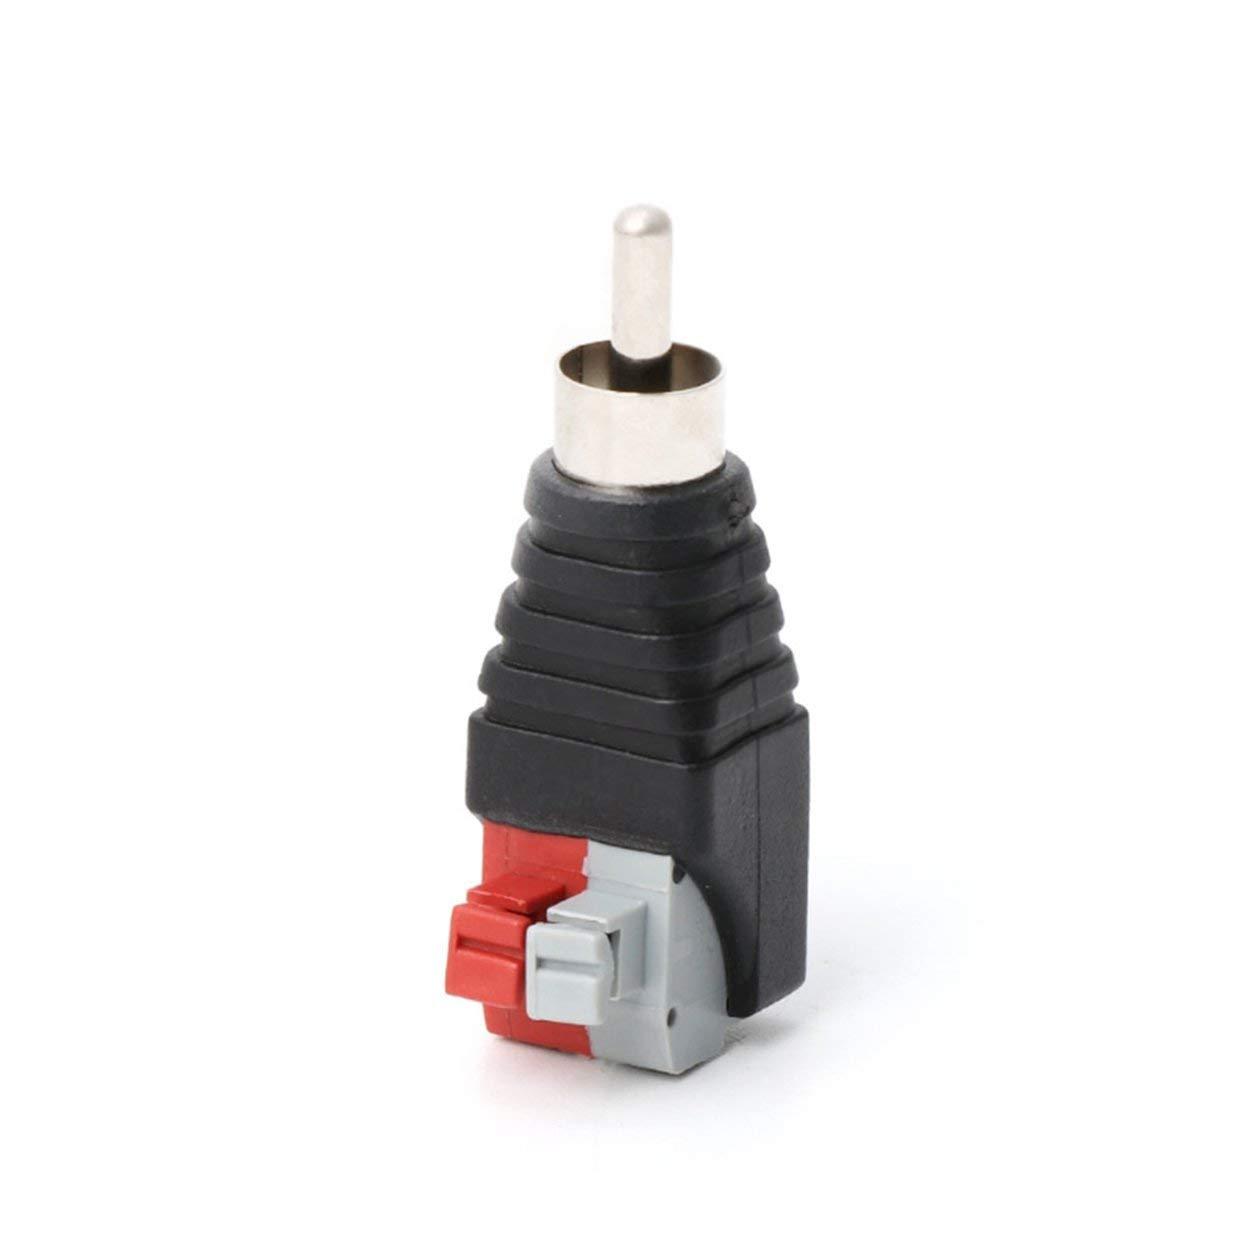 Rojo Gris Cable de Altavoz Cable de A//V a Audio Adaptador de Conector RCA Macho Jack Luces LED Simplemente Apariencia Profesional-Negro